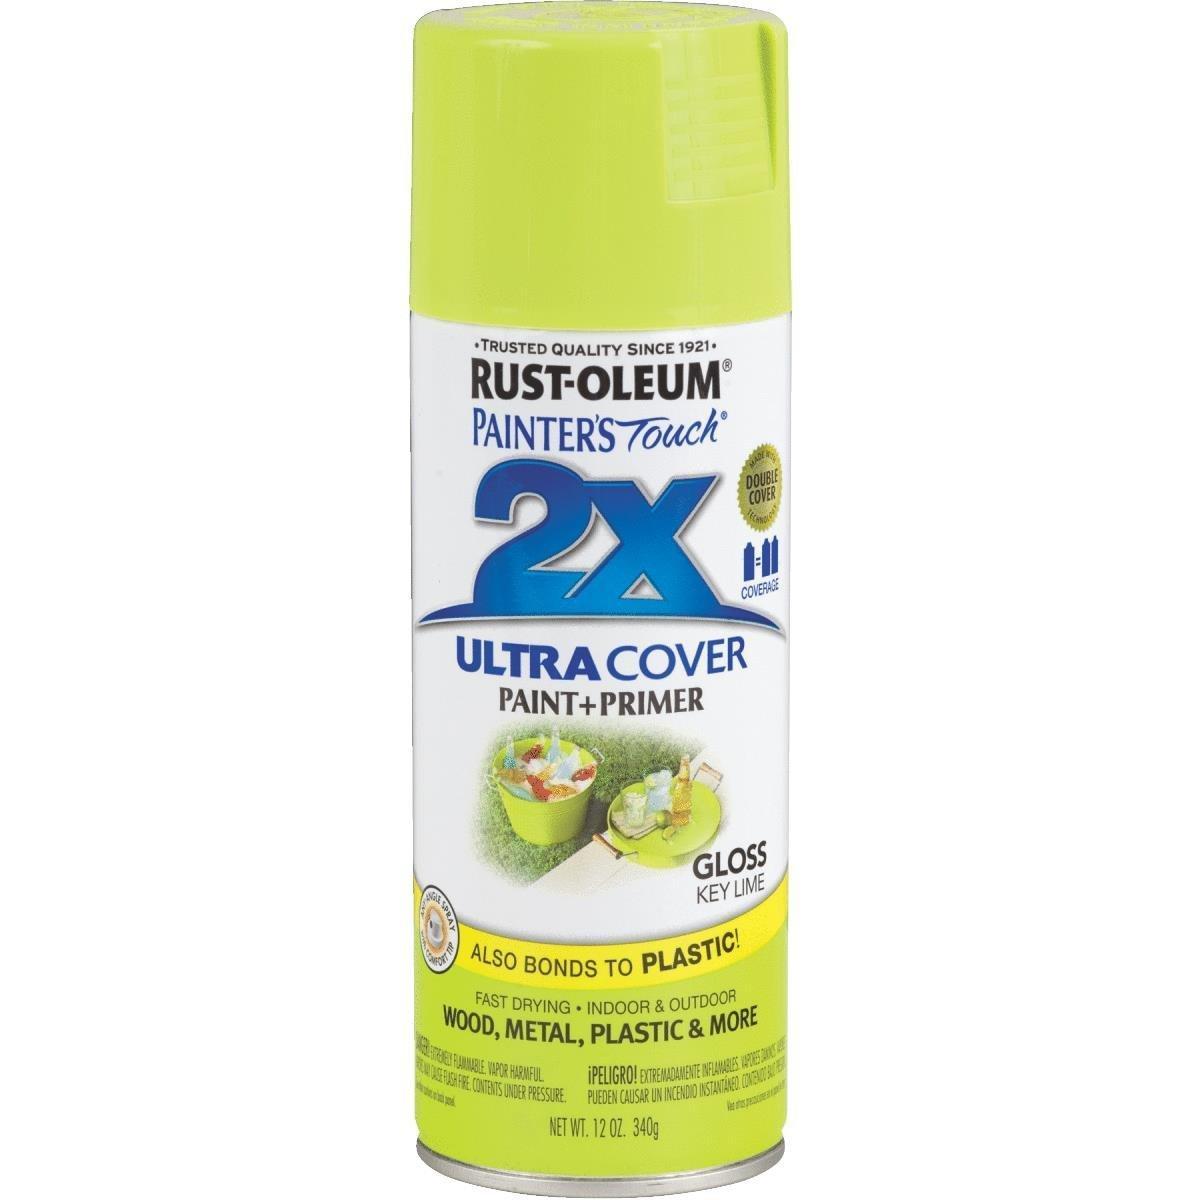 Rust-Oleum Ultra Cover 2X Spray Paint 12oz (Gloss Key Lime) RustOleum